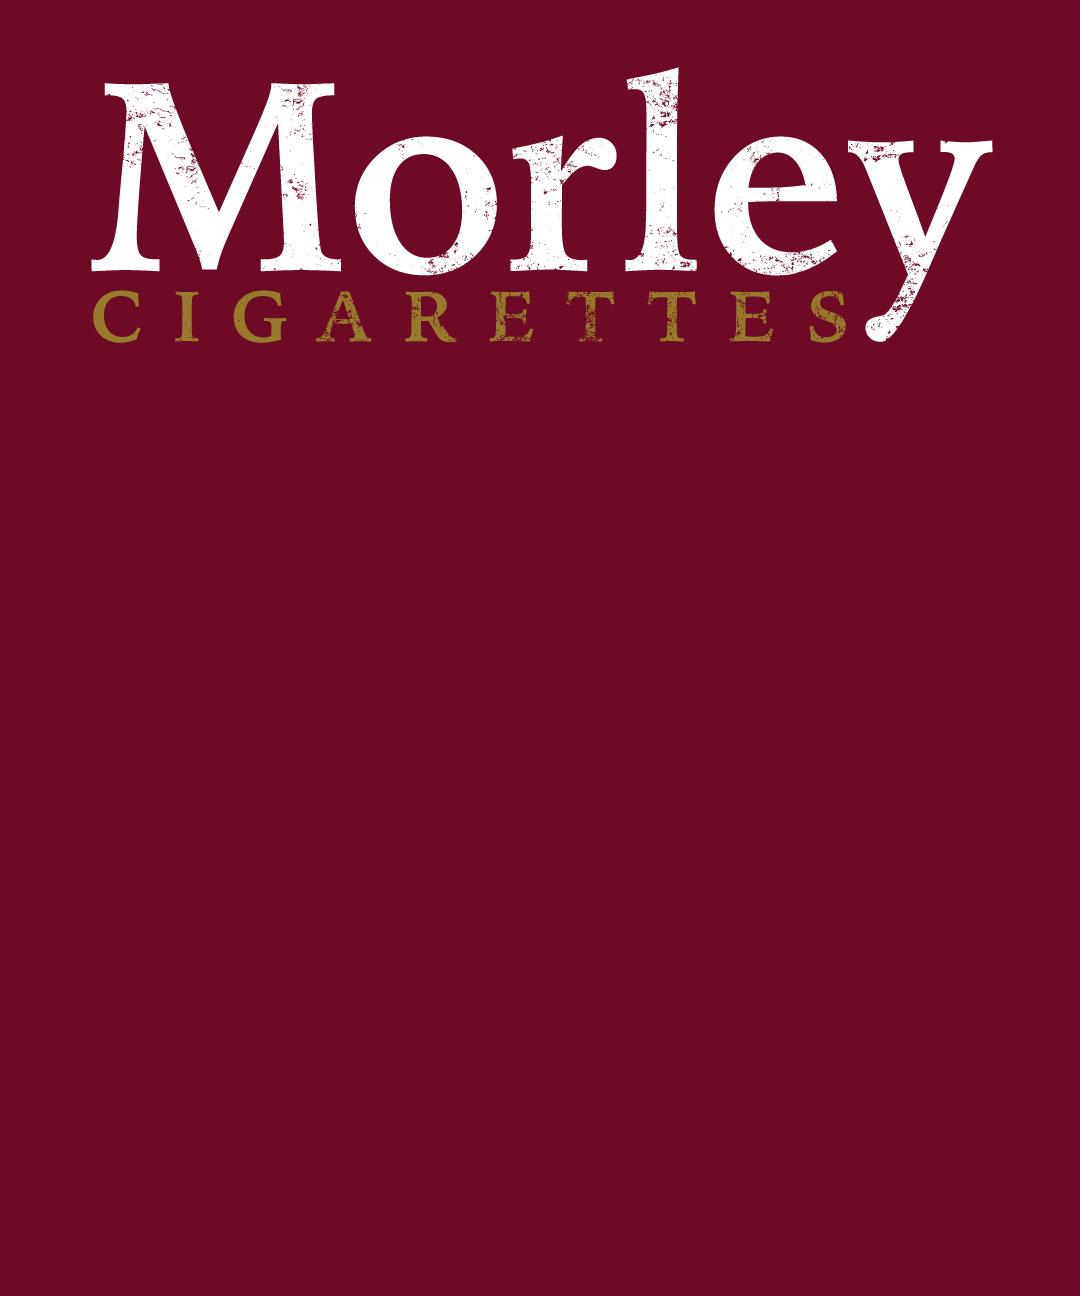 Morley Cigarettes T-Shirt